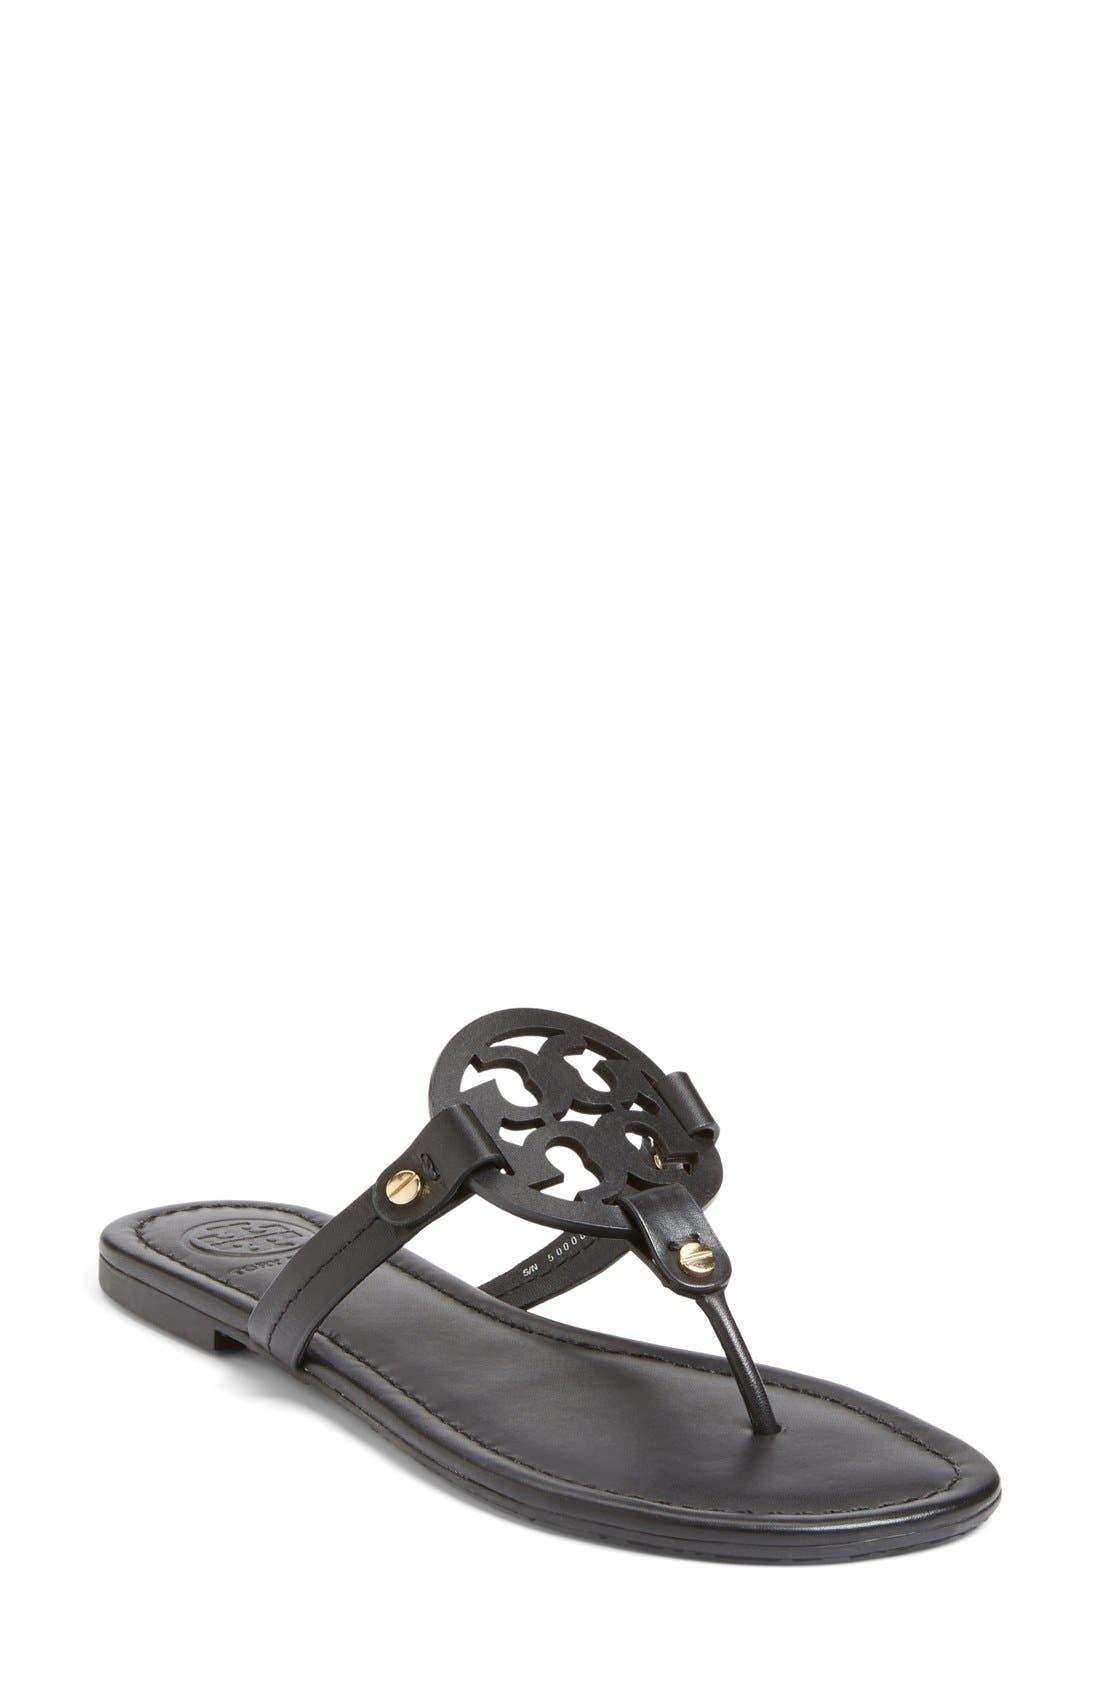 07537e2e1342 Women s Yellow Sandals